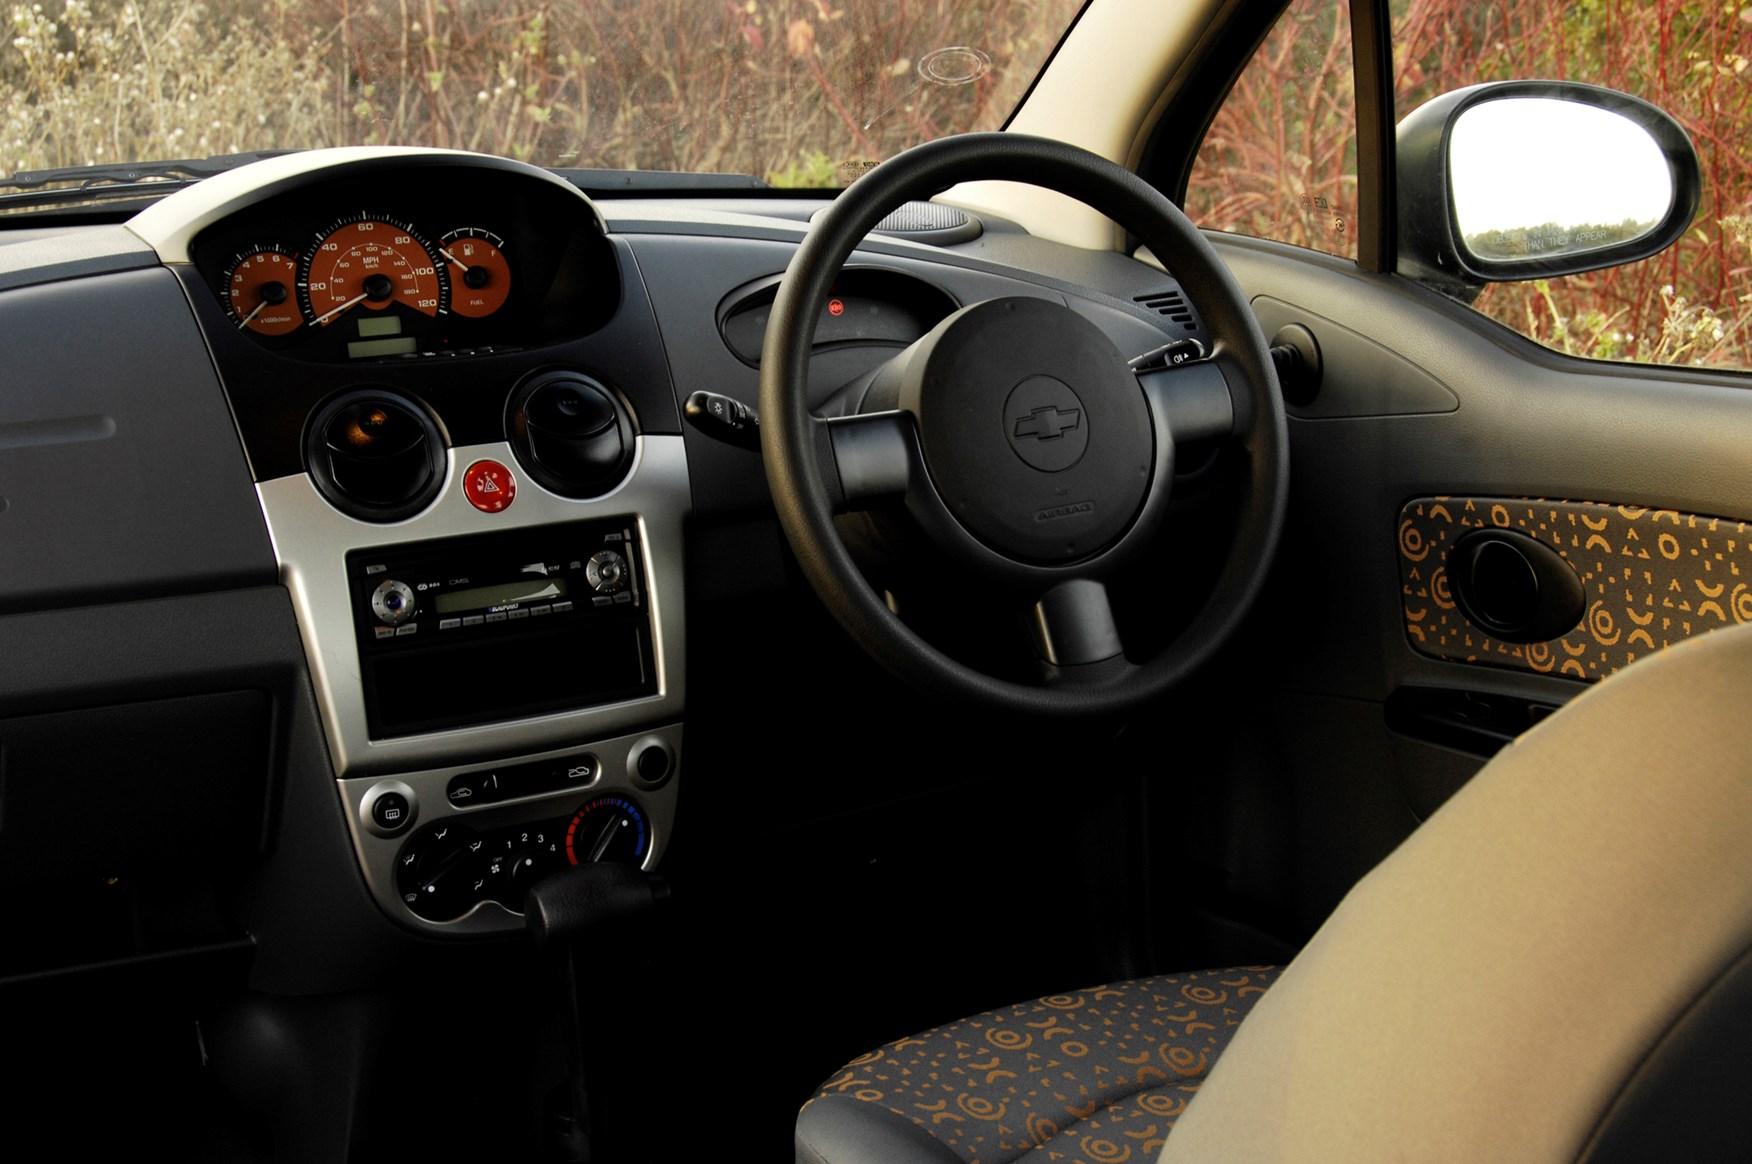 chevrolet matiz hatchback review (2005 2009) parkers Chevrolet Matiz Interior  Daewoo Matiz Engine Daewoo Matiz Accessories Daewoo Matiz Tuning